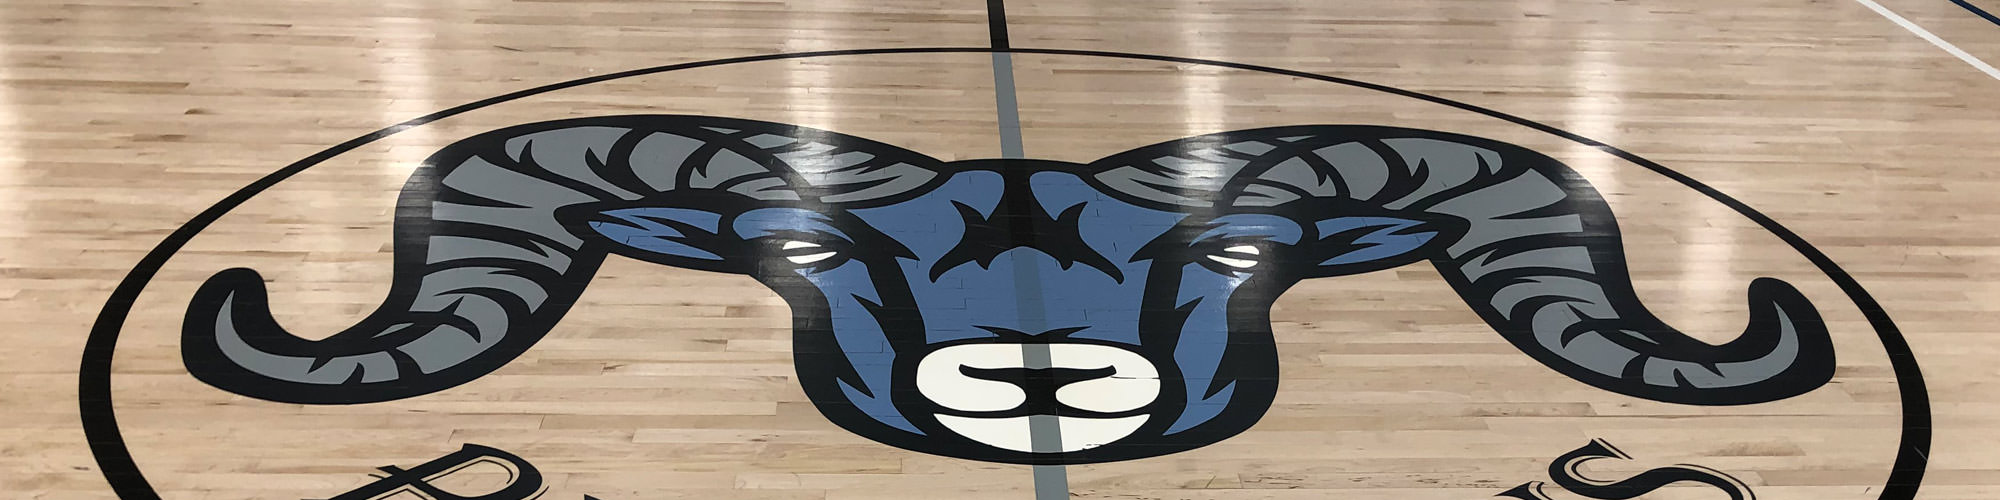 ram mascot logo on gym floor